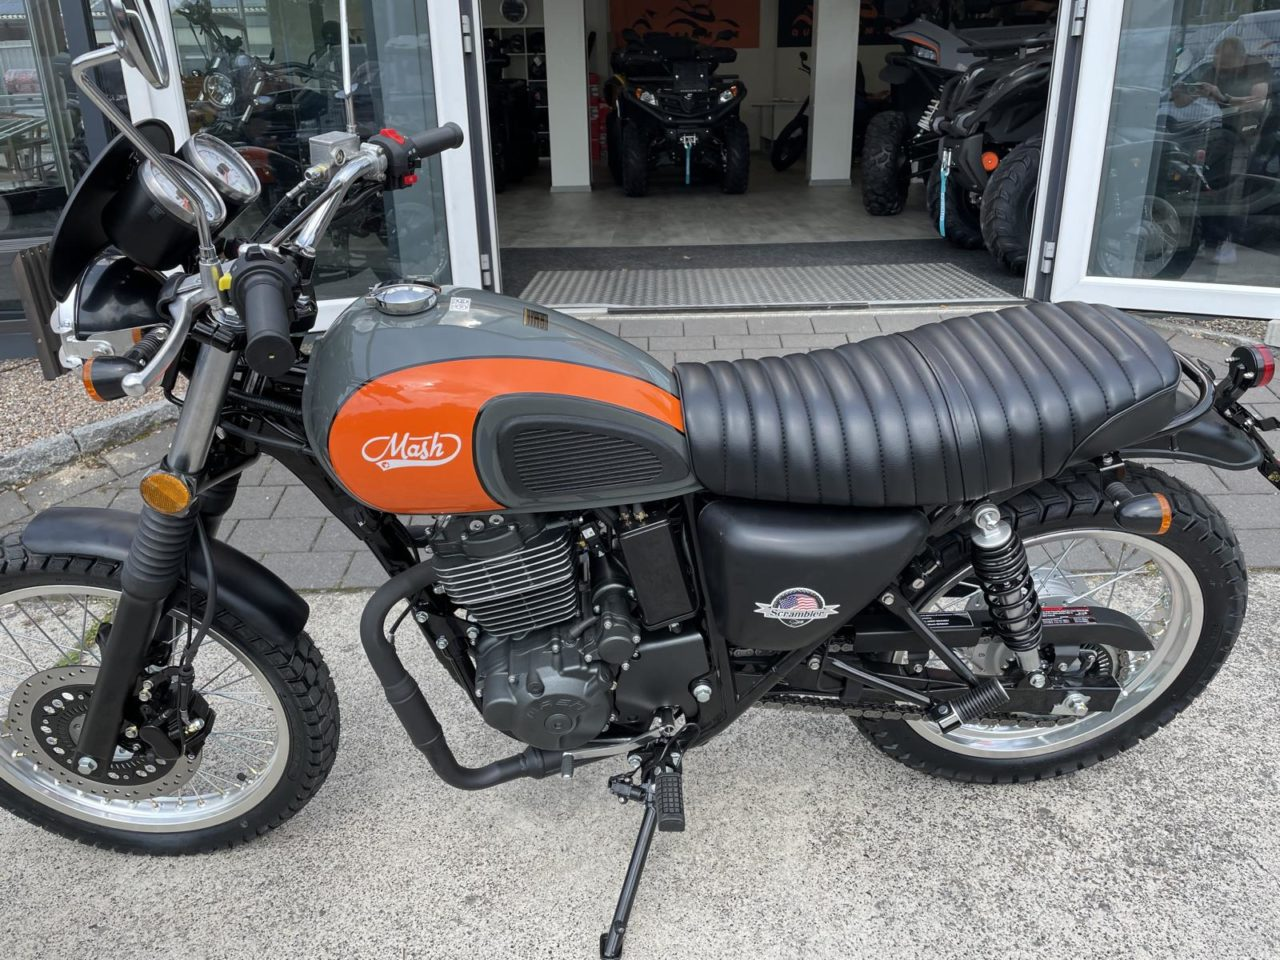 Motorrad Mash Scrambler 400 ccm ABS, Euro 4